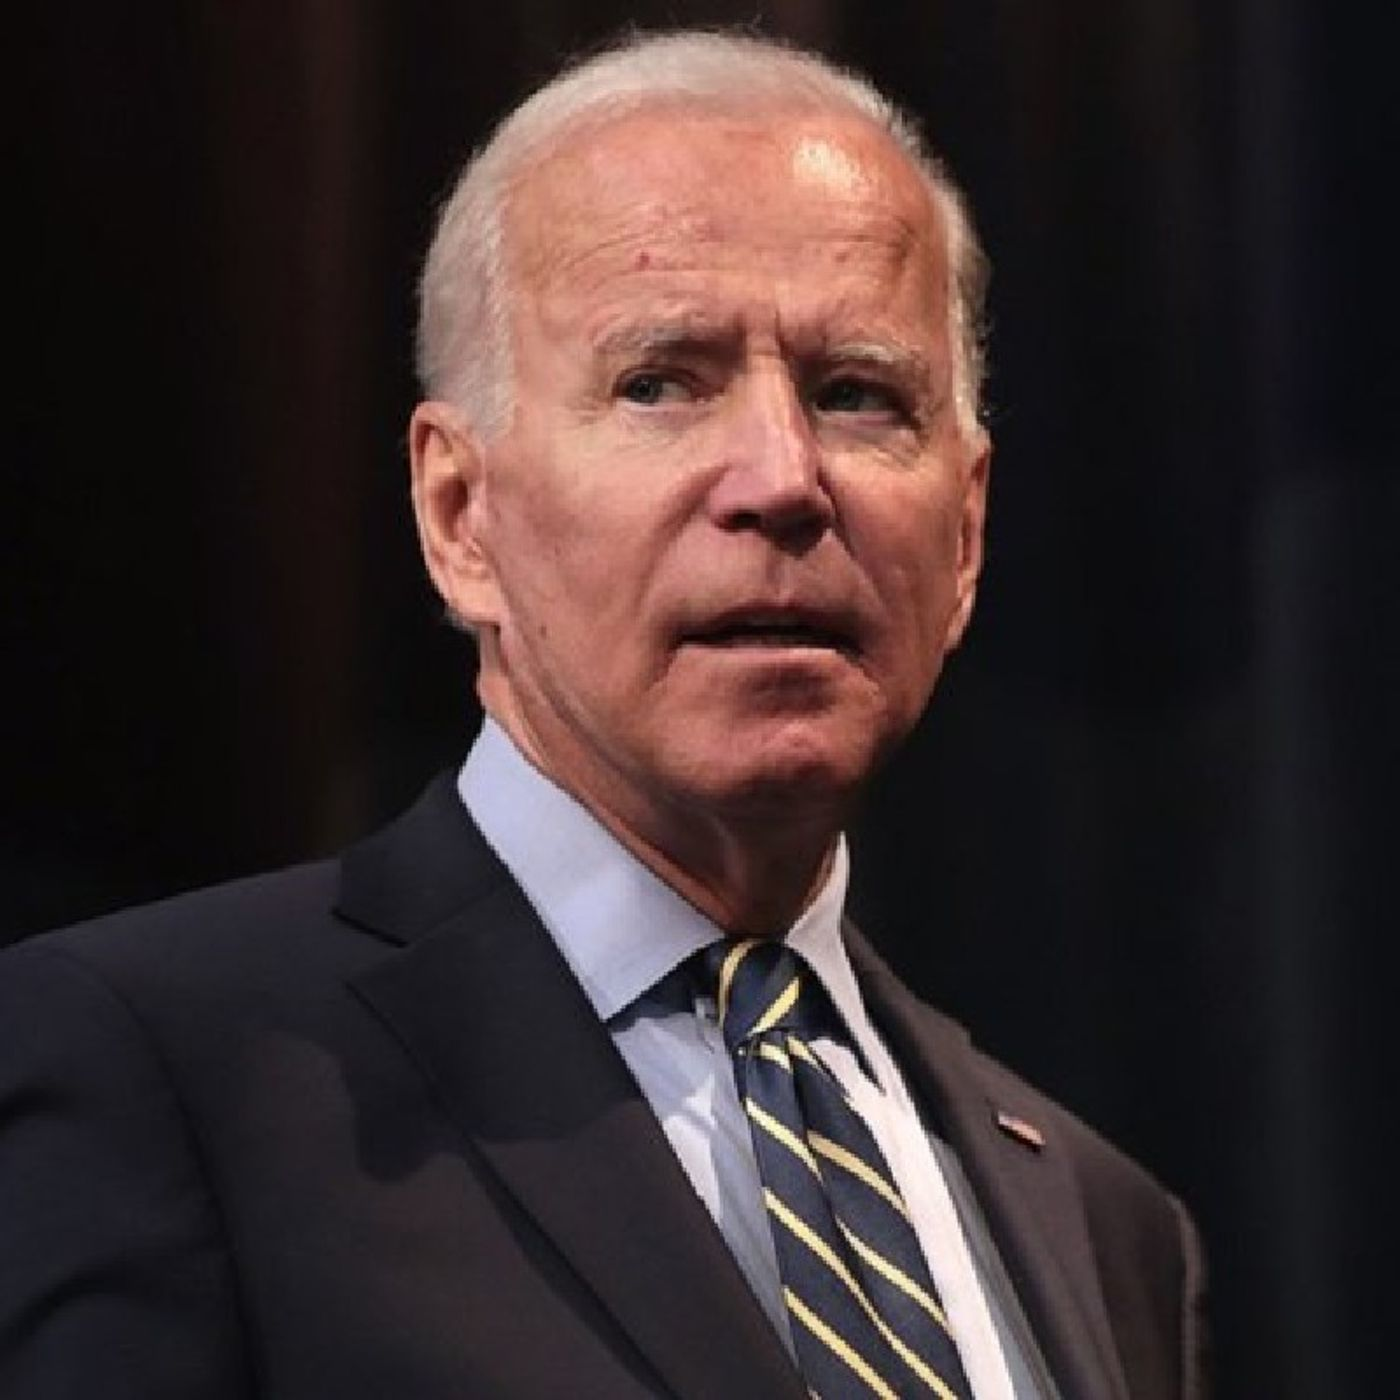 Episode 1389 - Biden's multi-trillion-dollar spending plan will devastate religious liberty and the U.S. economy